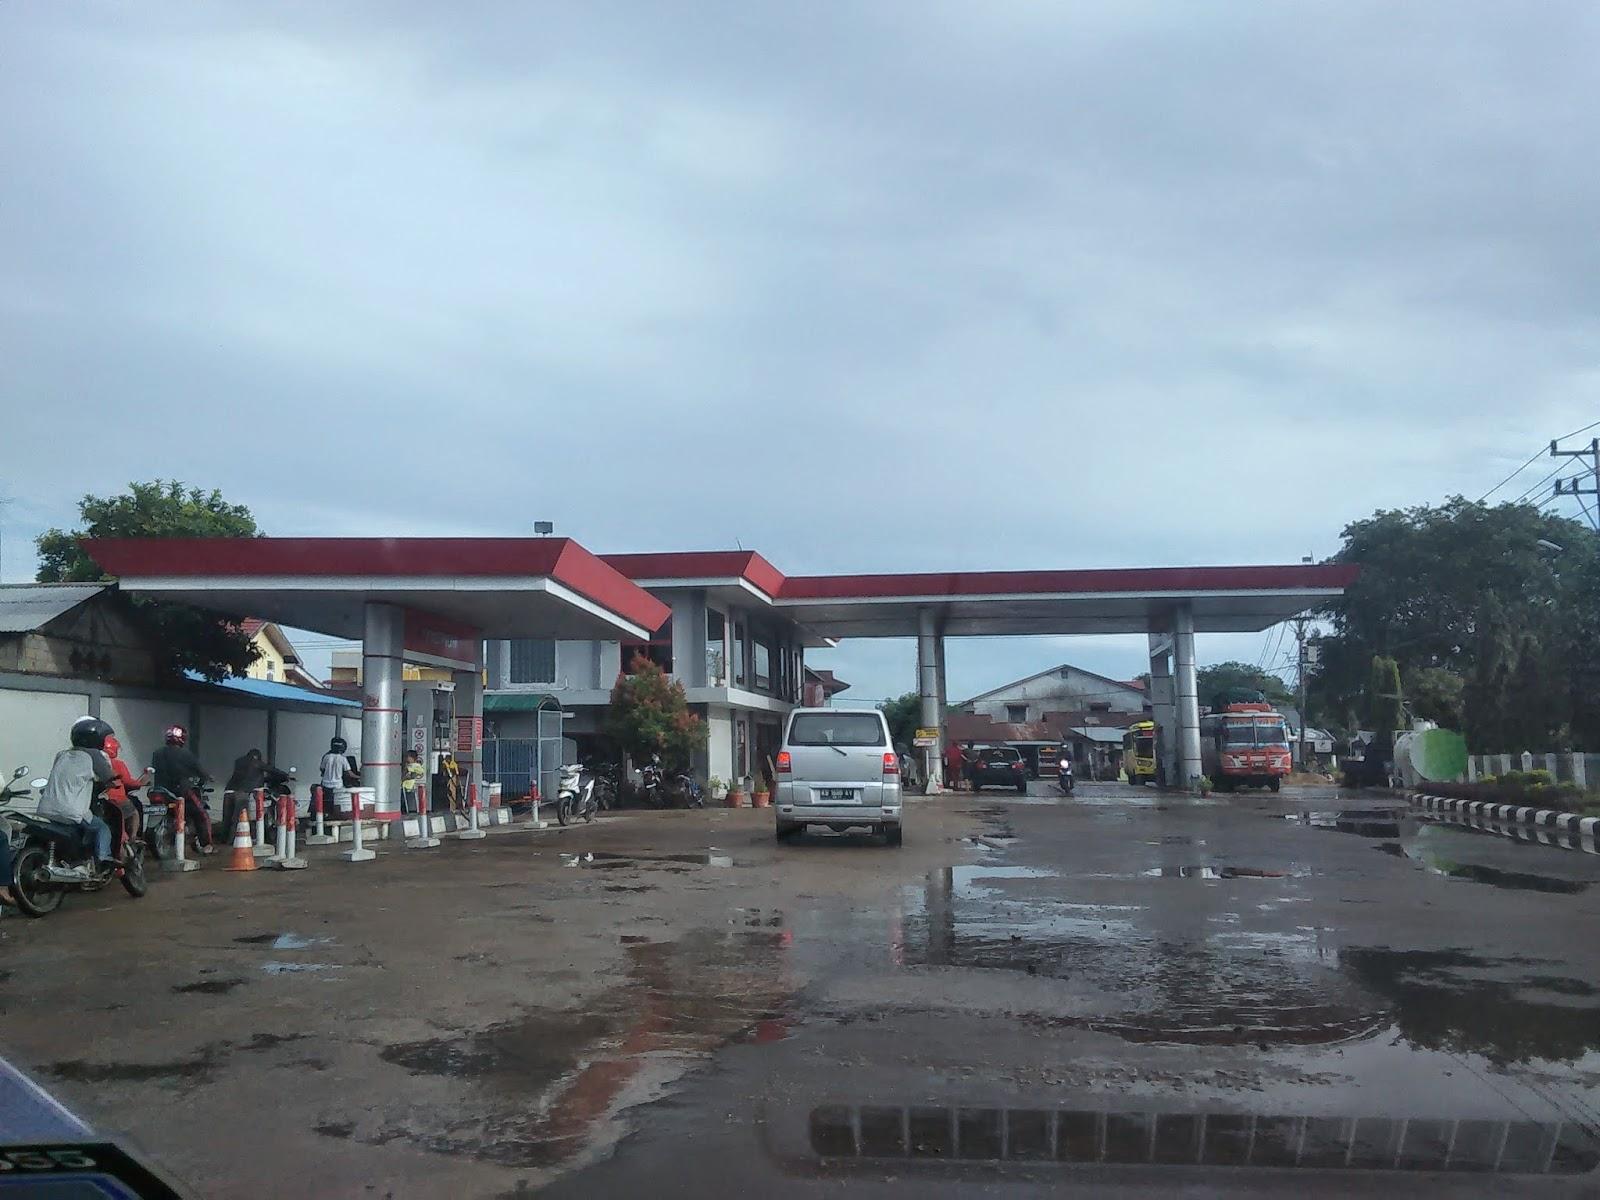 Pertamina yang paling hampir dengan bandar Pontianak sebelum perjalanan pulang ke Malaysia